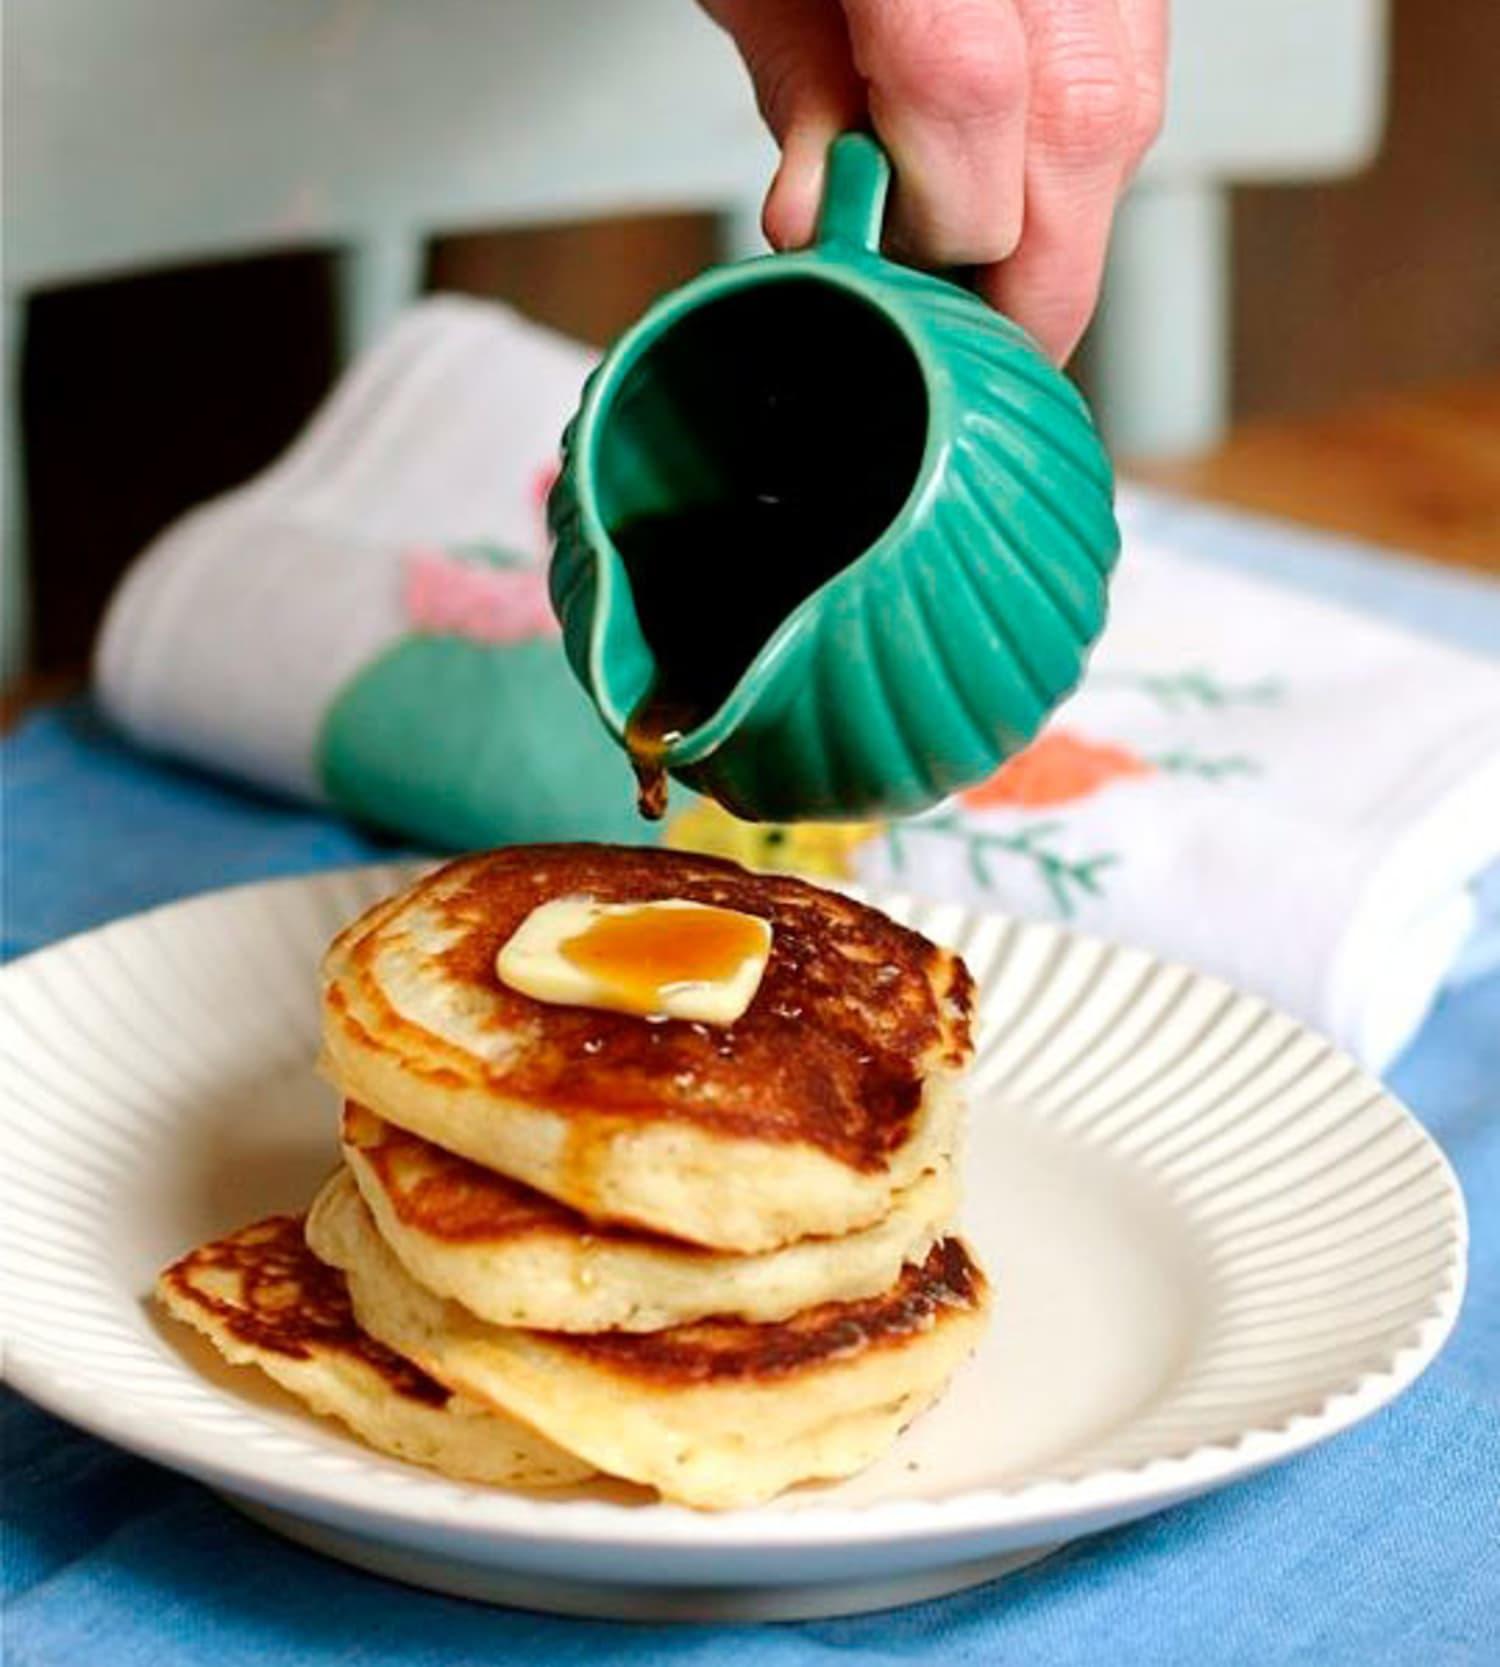 The Best Pancake Recipe: Lofty Buttermilk Pancakes